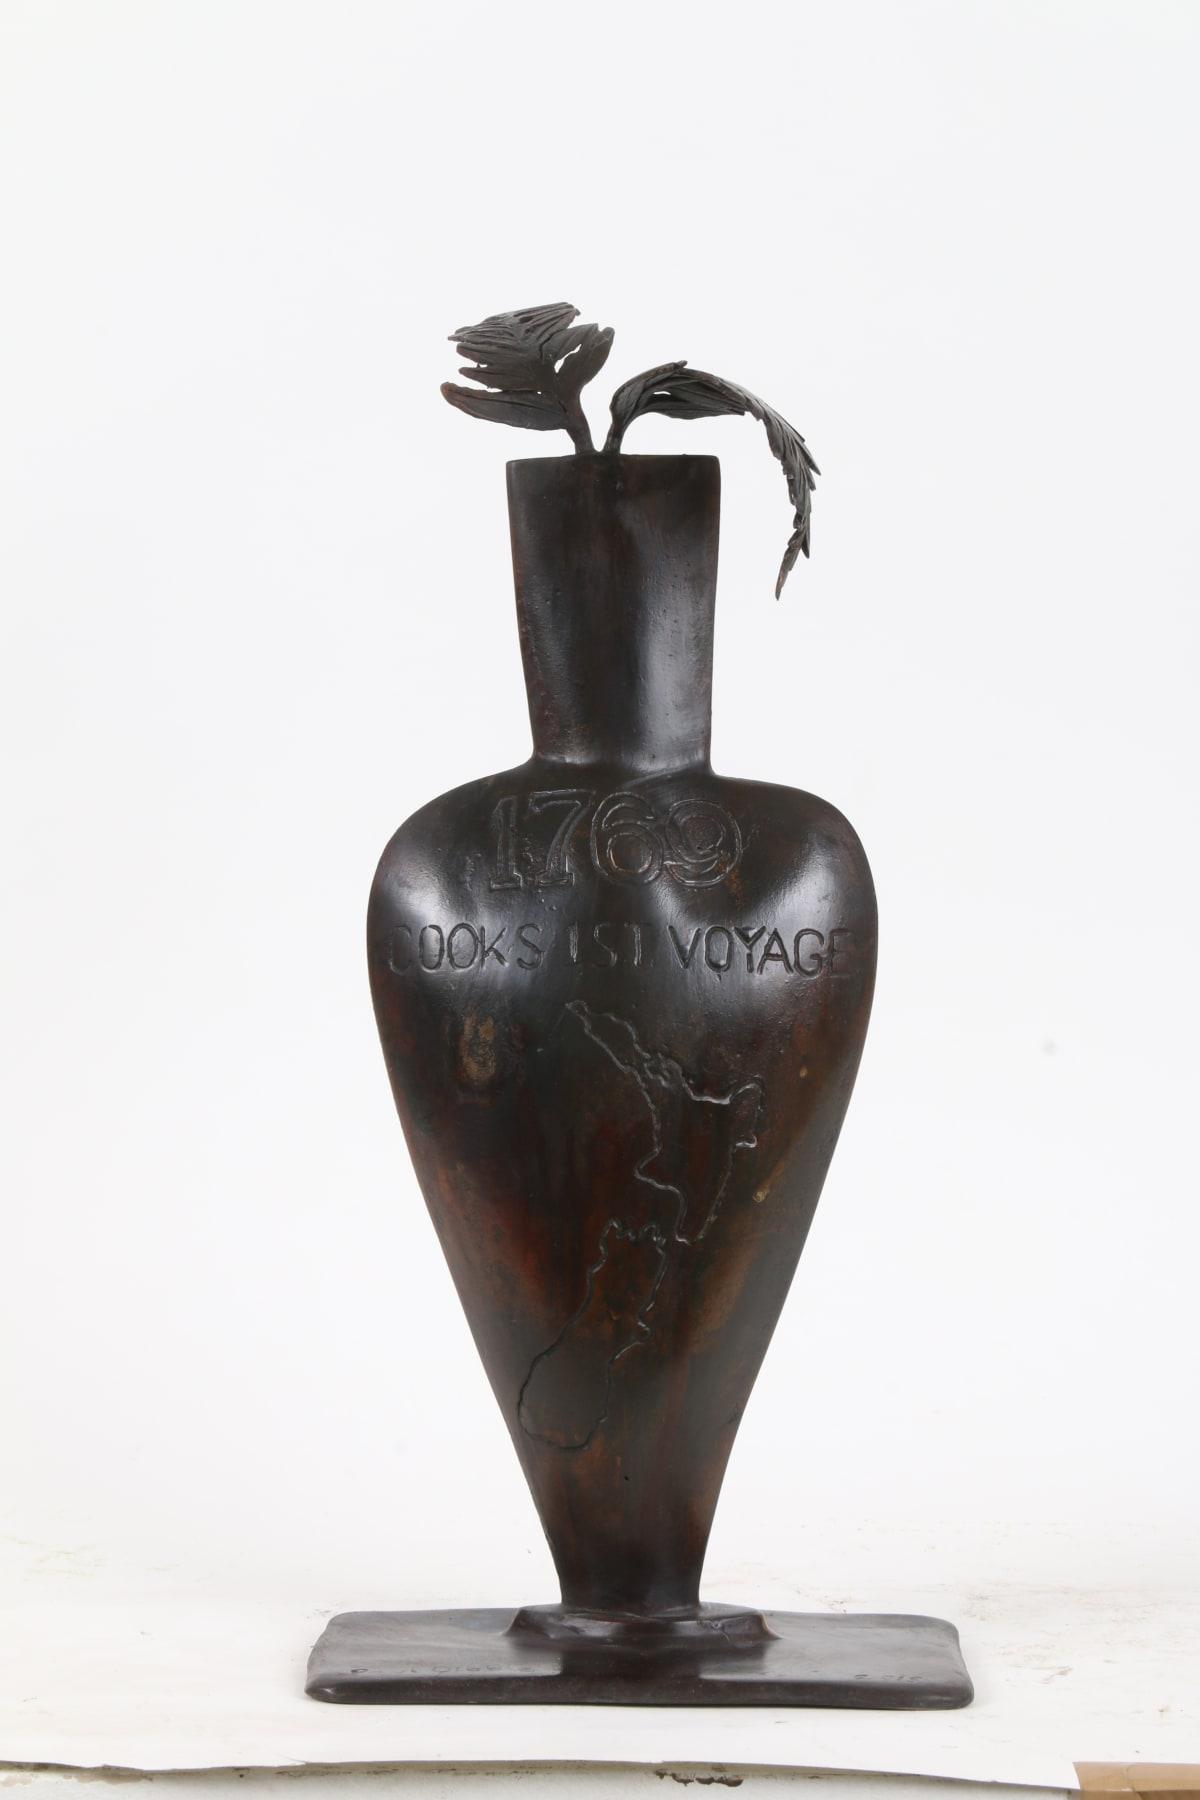 Paul DIBBLE New Zealand Fern in an Urn, 2015 Cast Patinated Bronze 19.7 x 8.7 x 5.1 in 50 x 22 x 13 cm